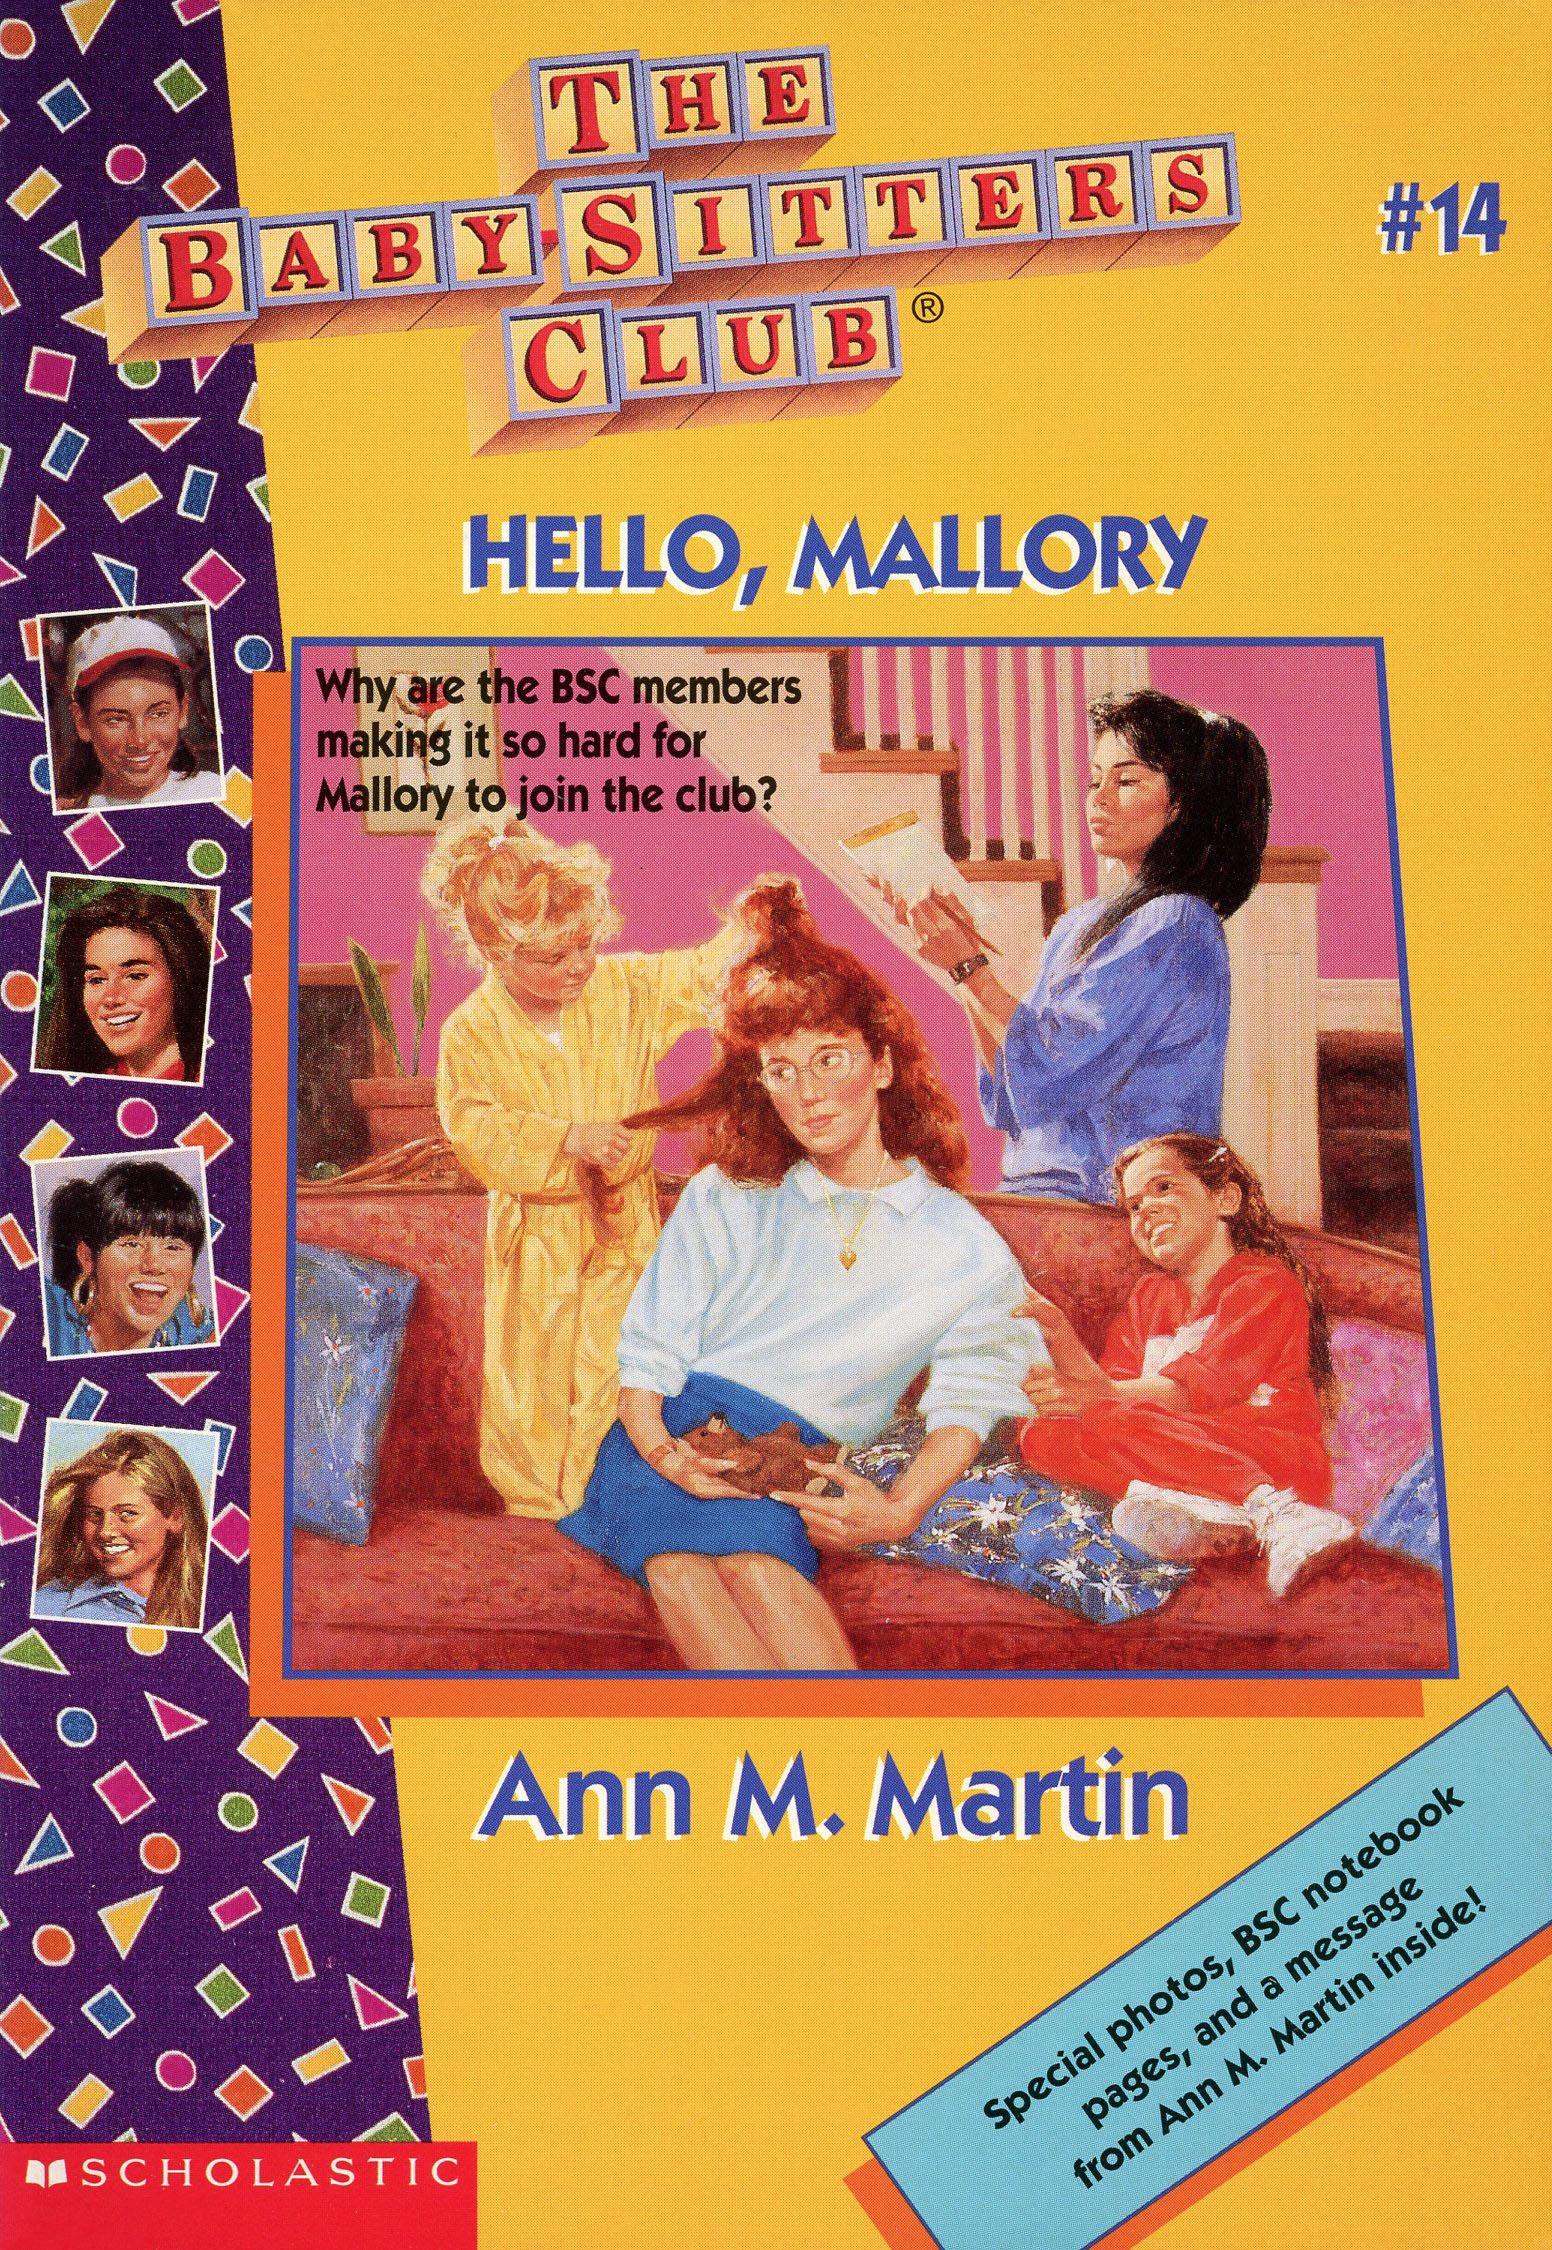 Hello, Mallory | The Baby-Sitters Club Wiki | FANDOM ...